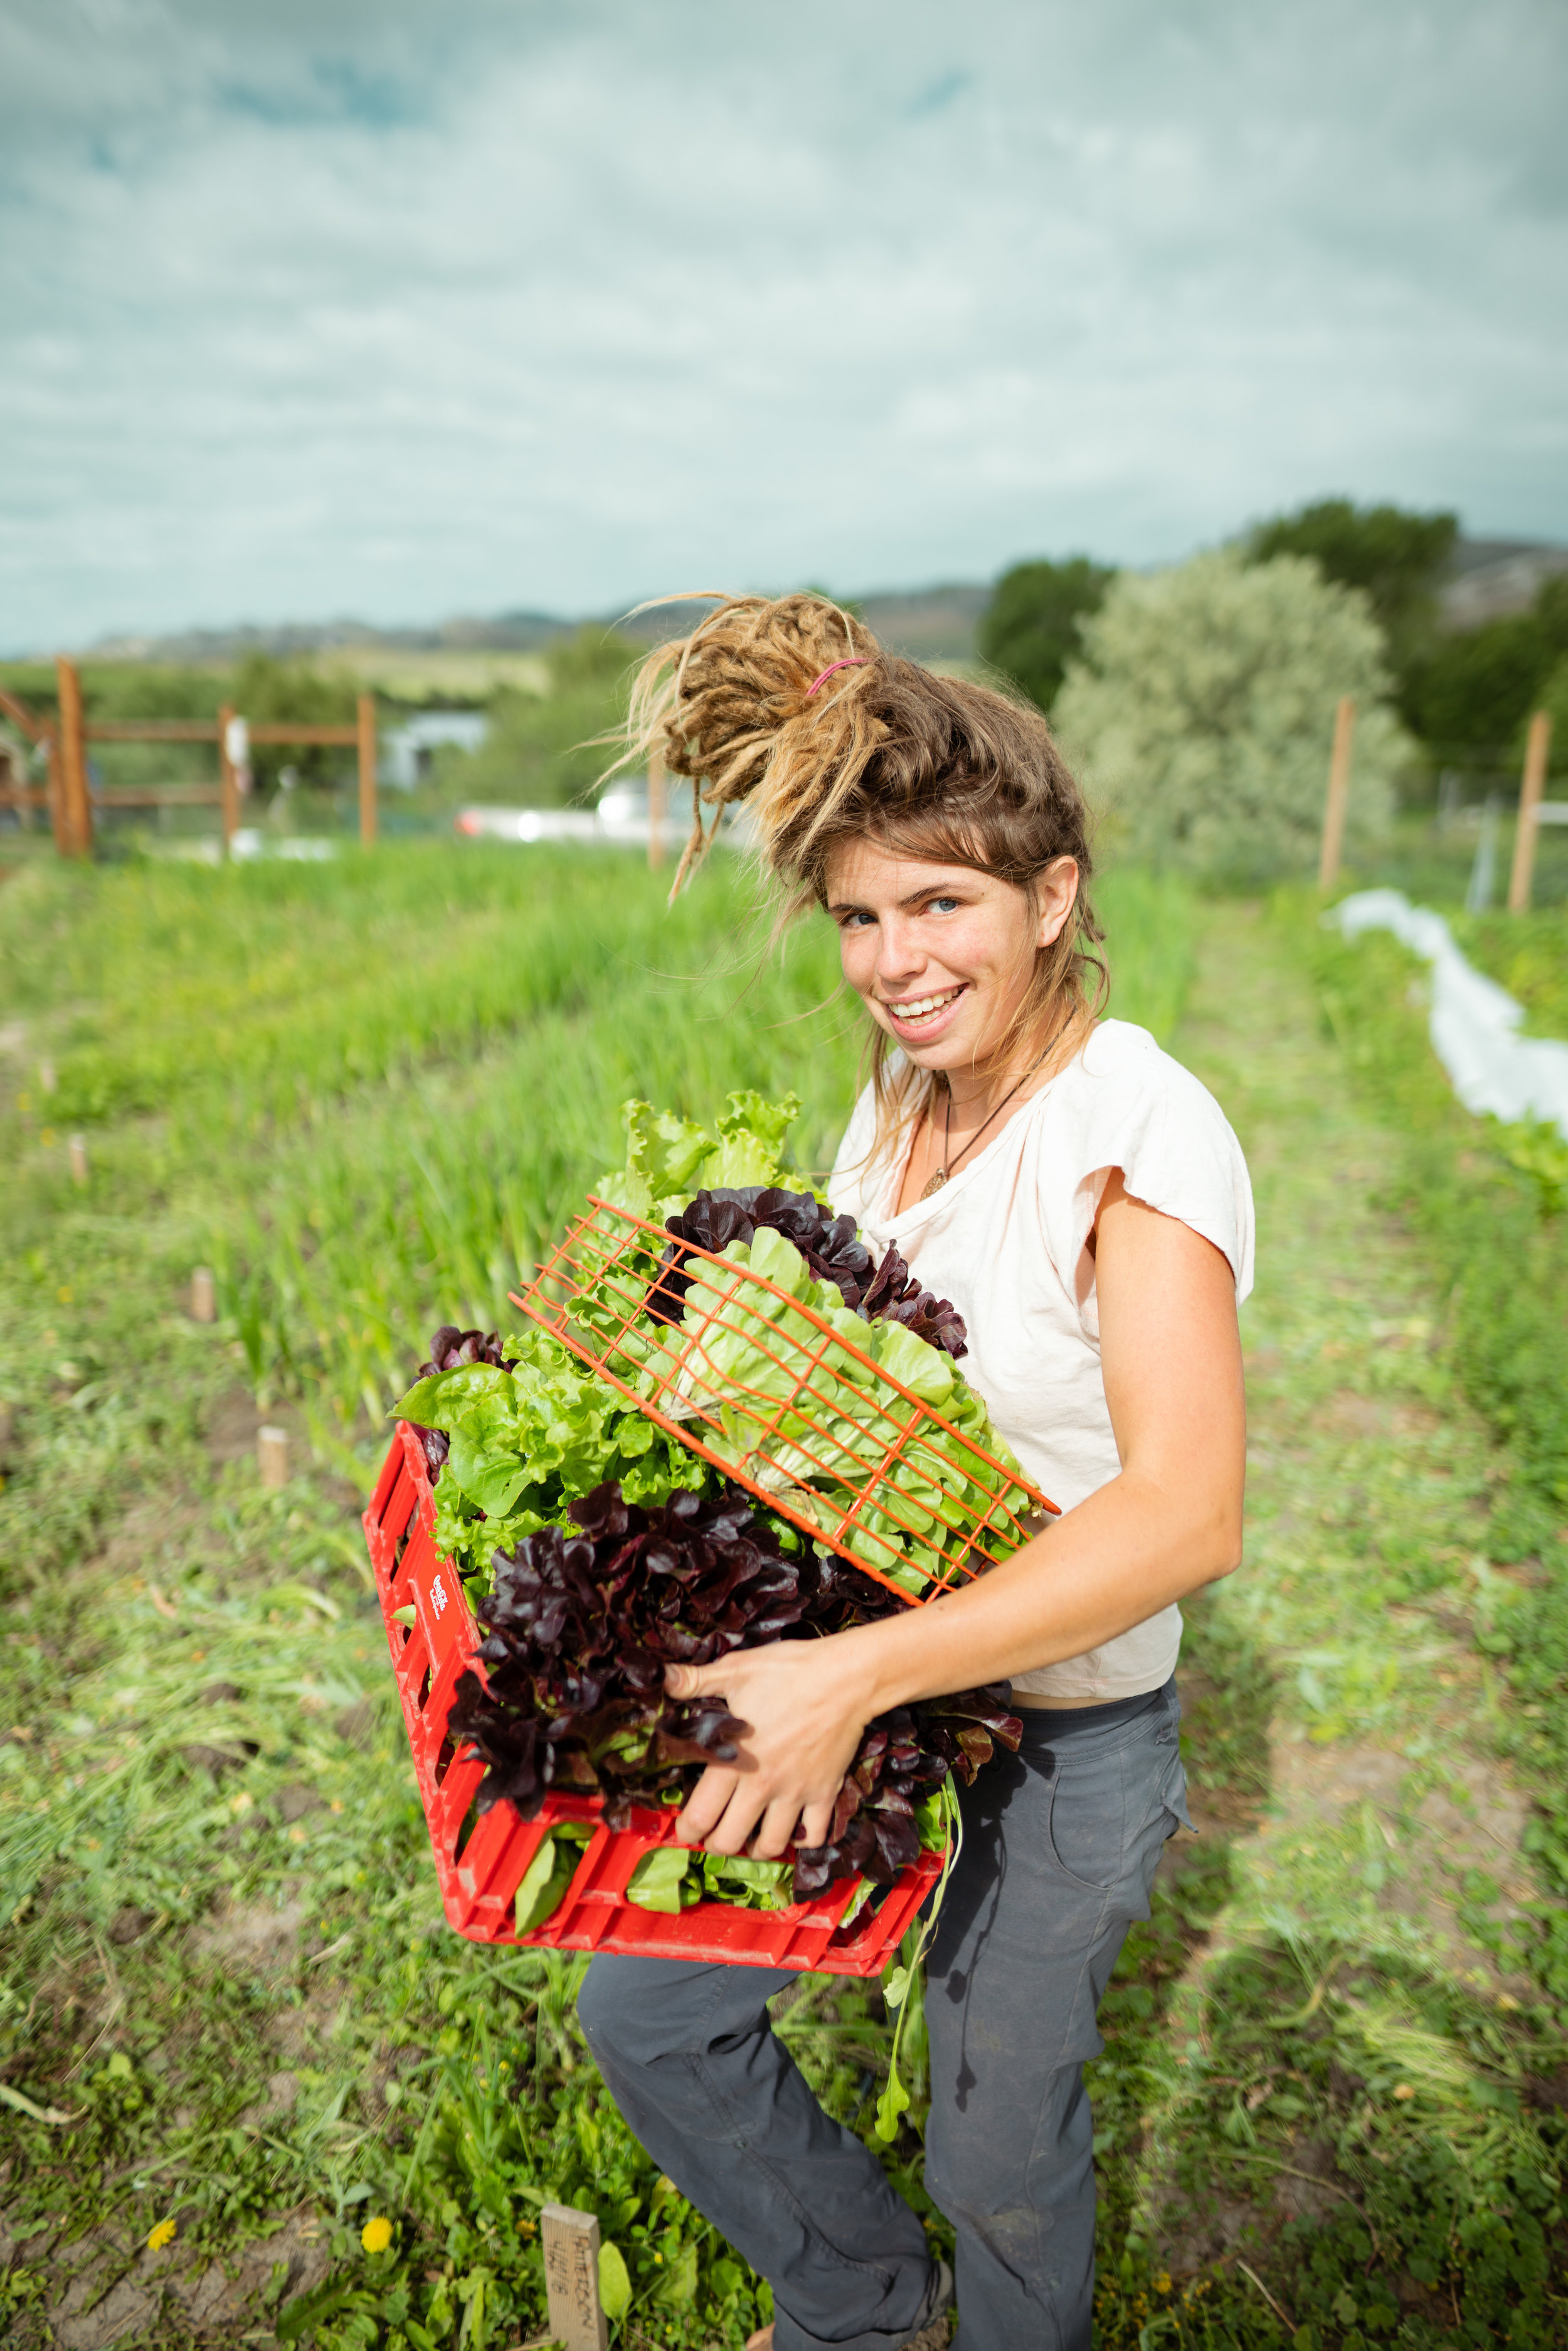 Kacy Senger picking lettuce at Sprig & Root Farm in Clarkston, Montana.